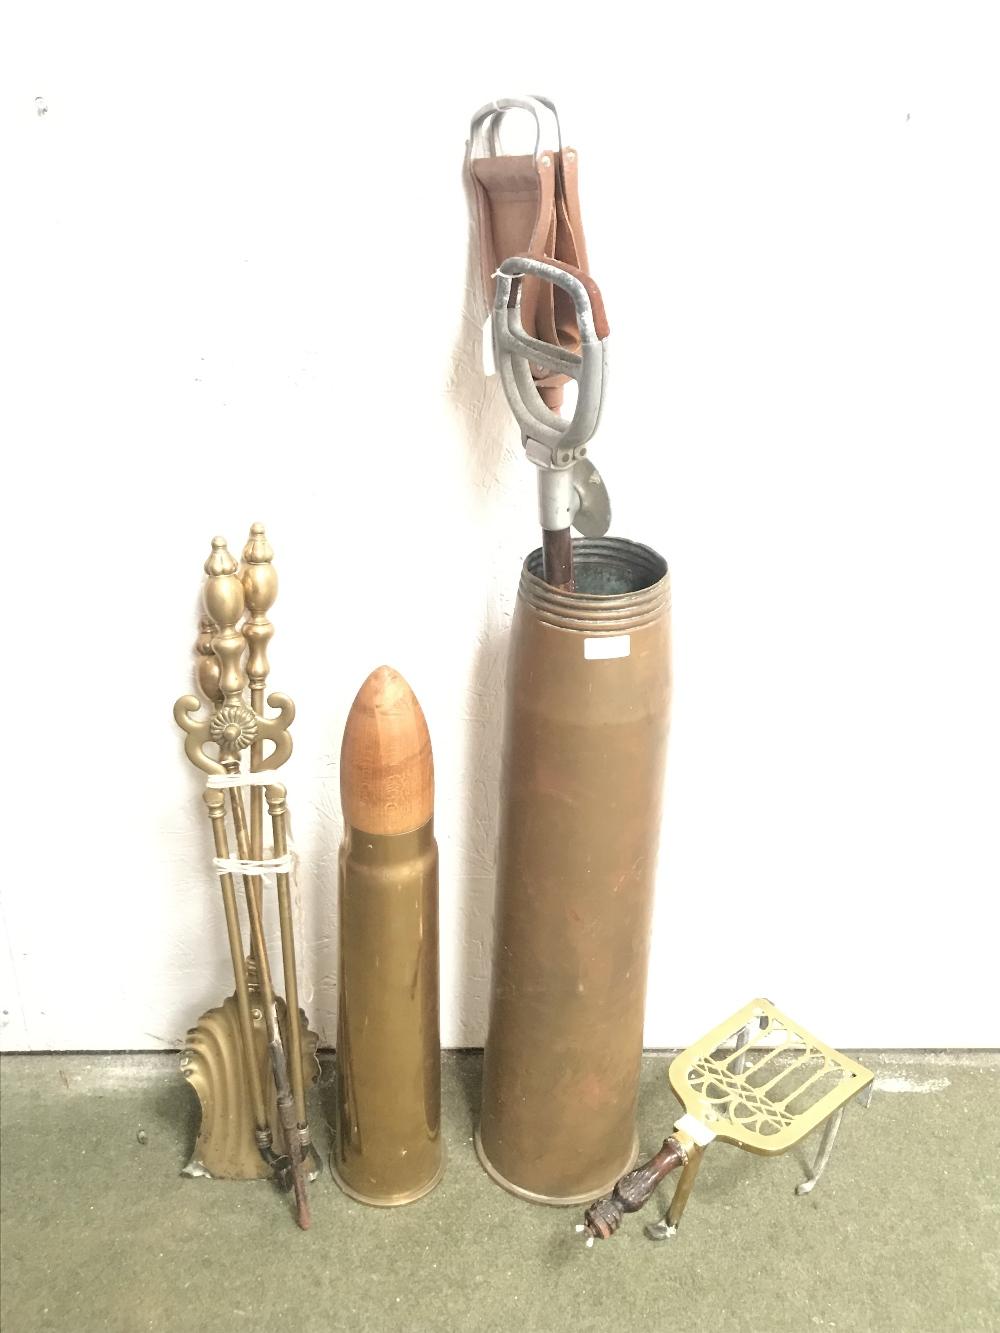 Lot 245 - Large (64 x 16cm) brass shell case, 2 shooting sticks, fire irons & a trivet. 1917 shell case (42cm)